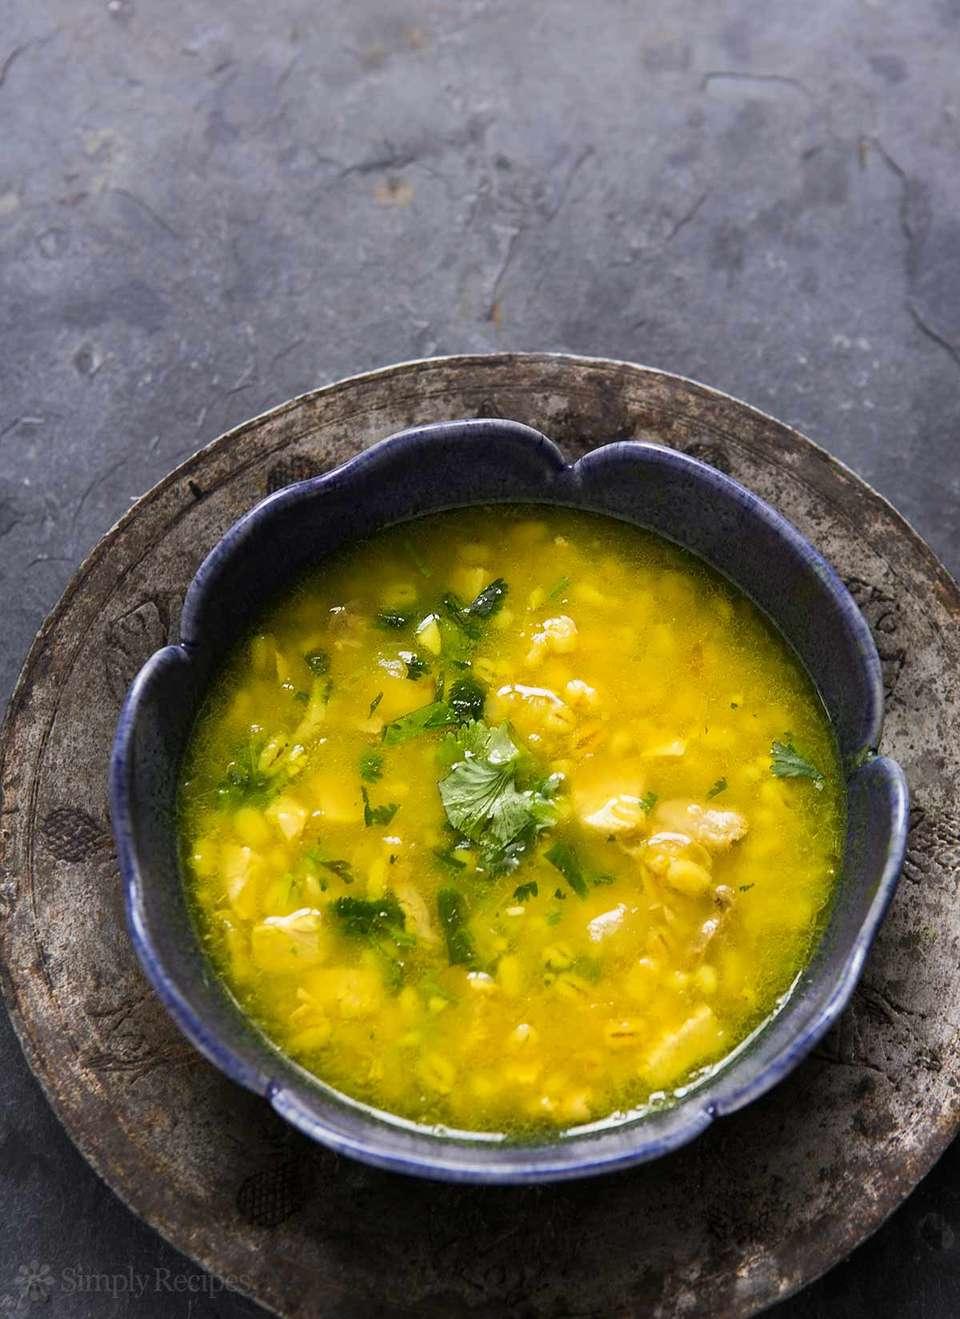 Turkey Soup with Lemon and Barley